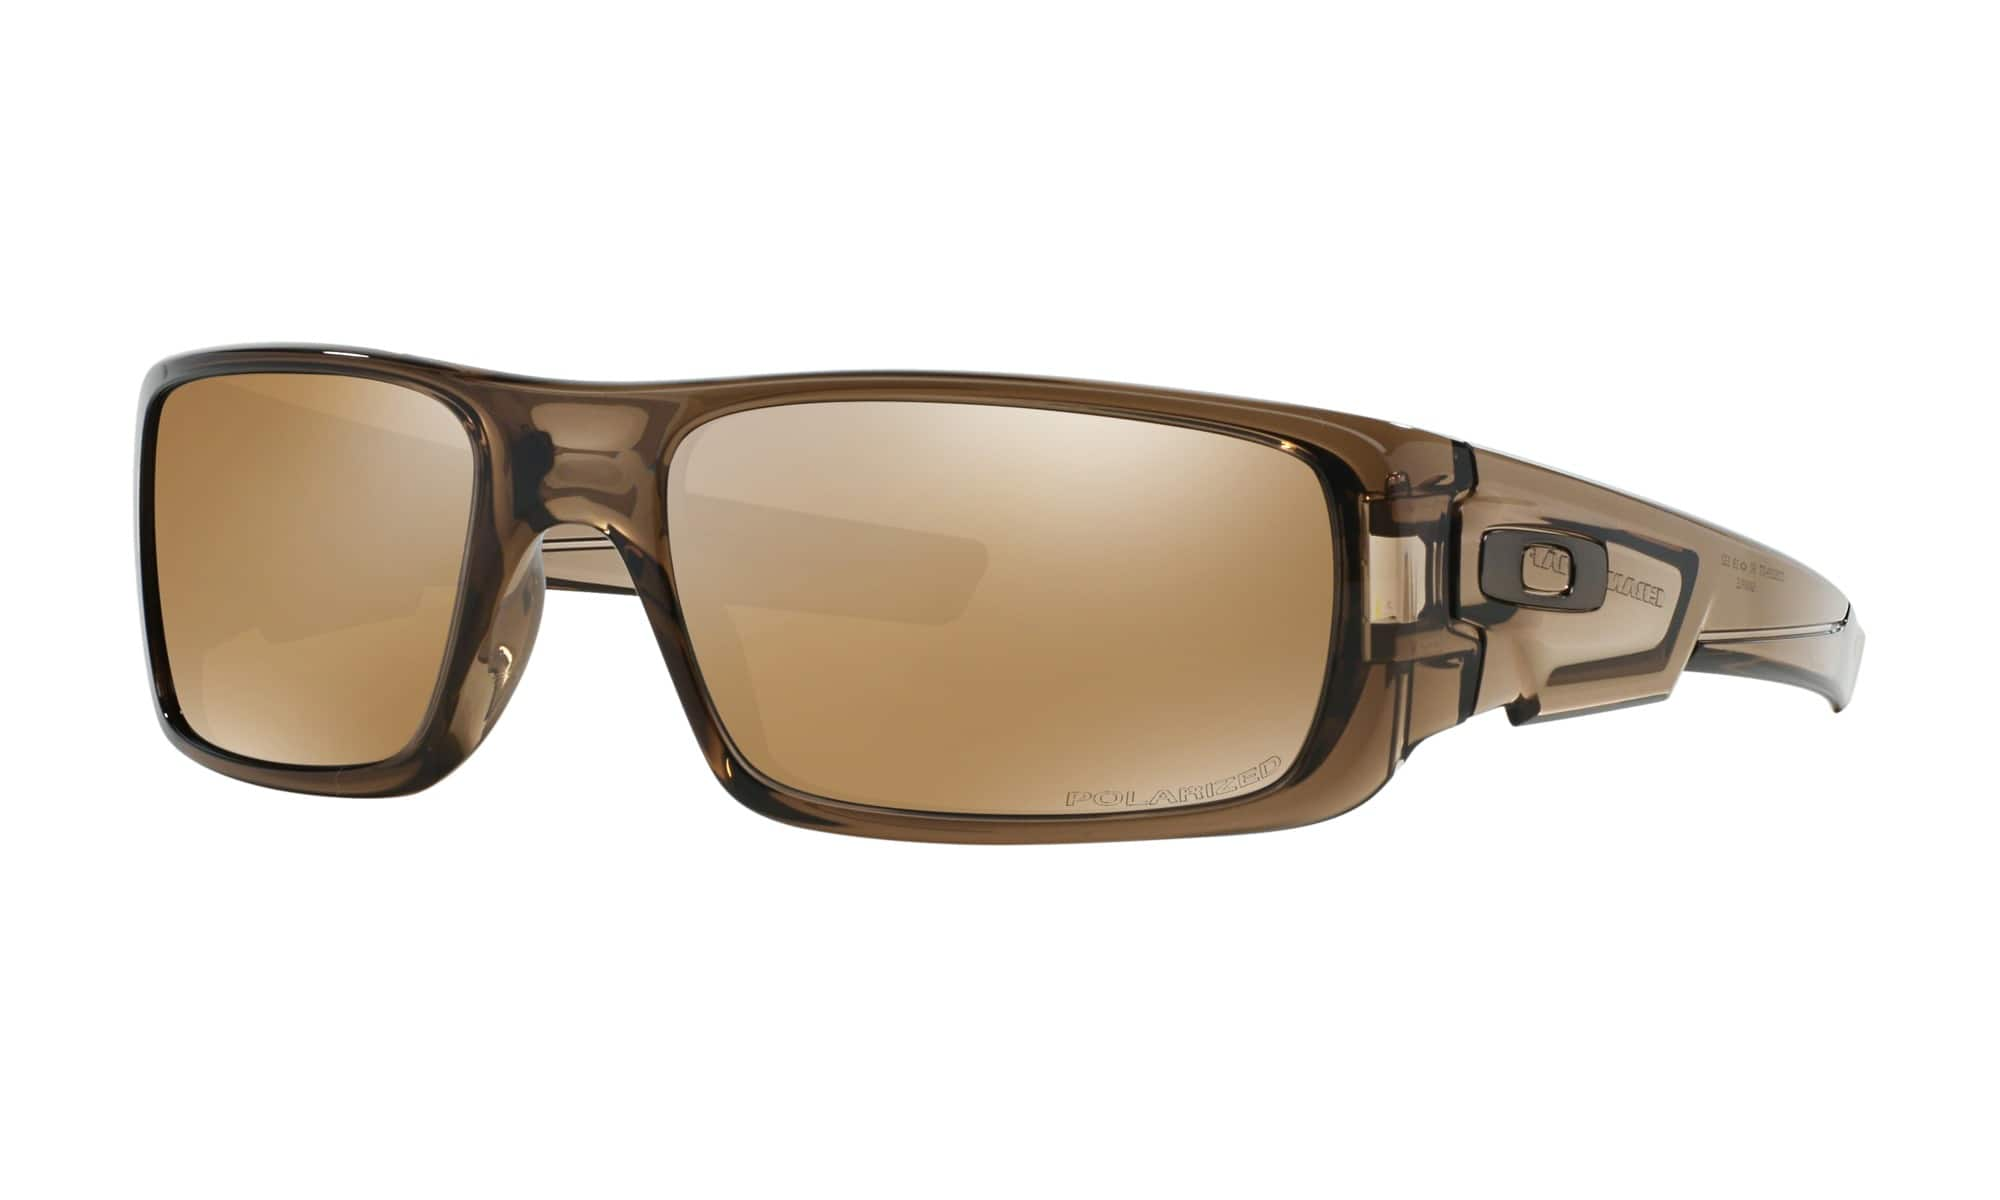 Oakley Crankshaft Sunglasses (Brown) $79.99